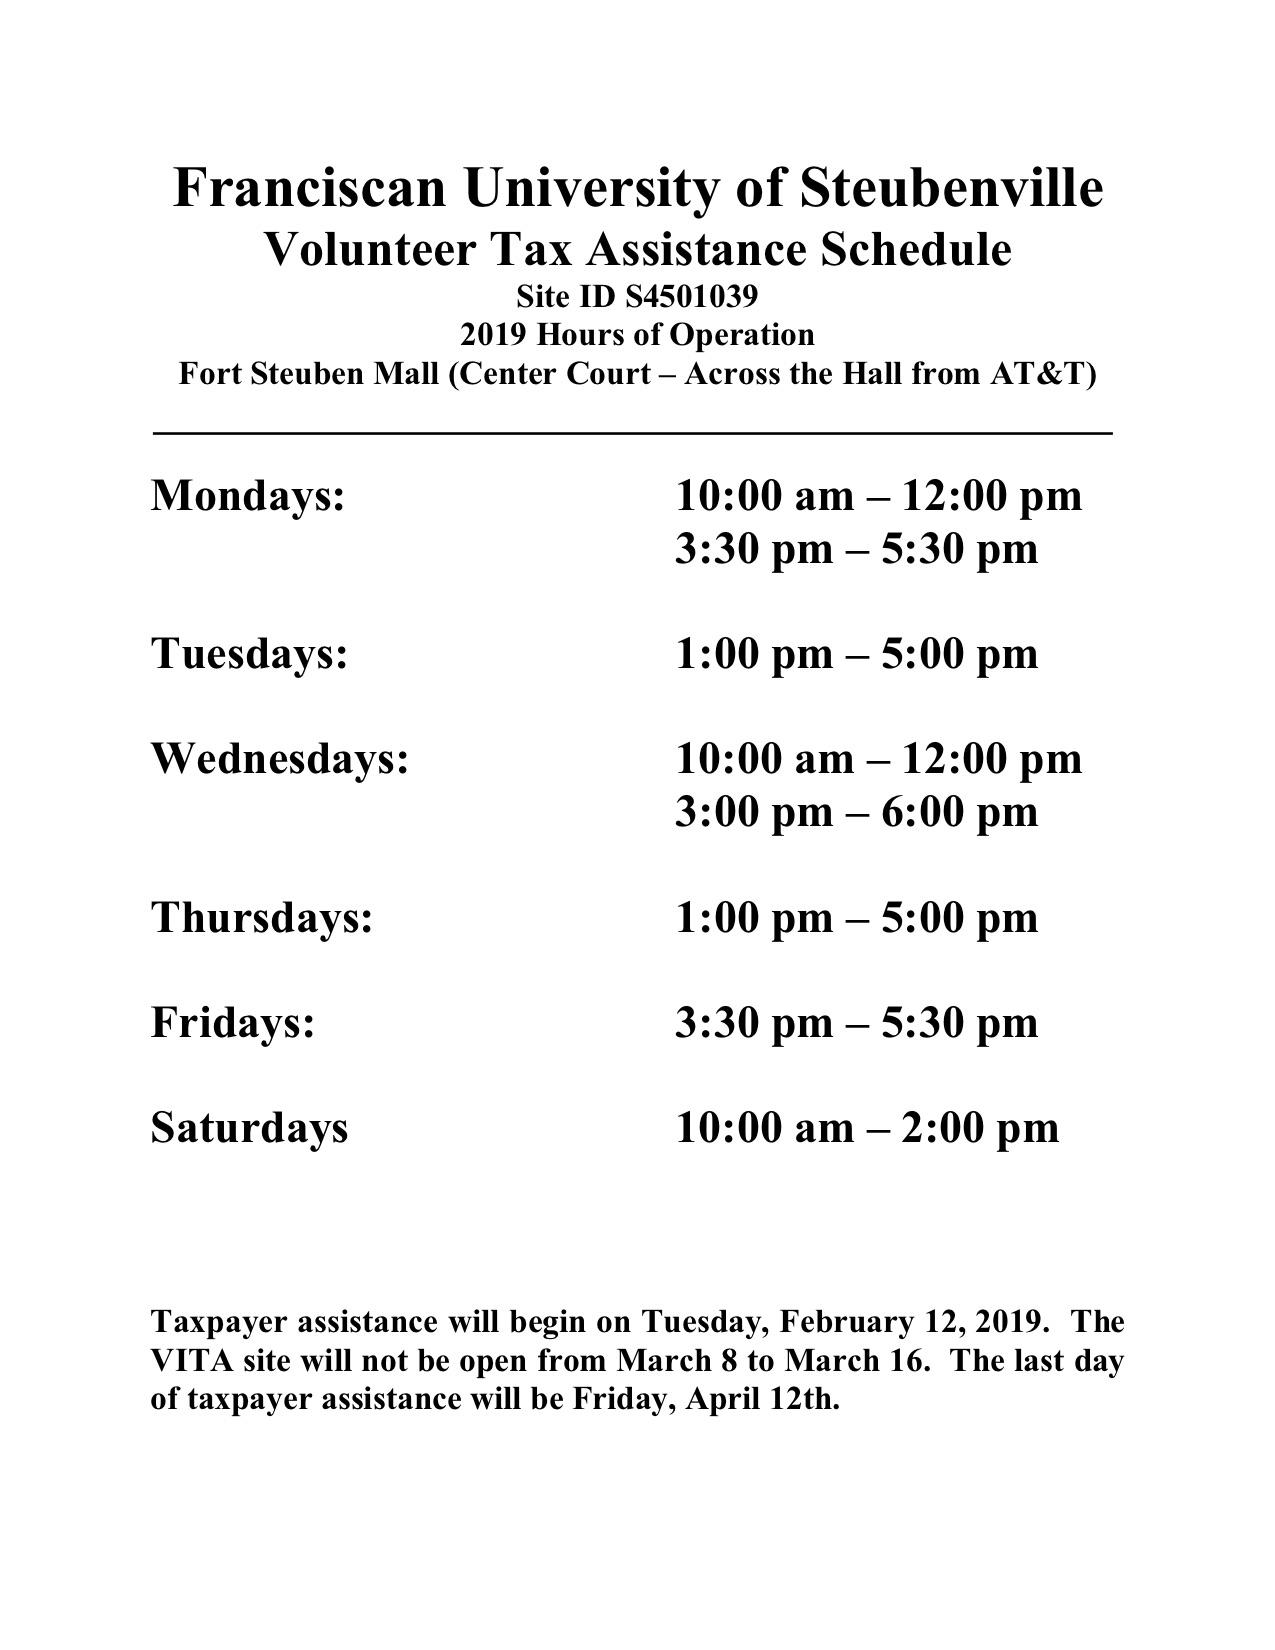 tax help text information